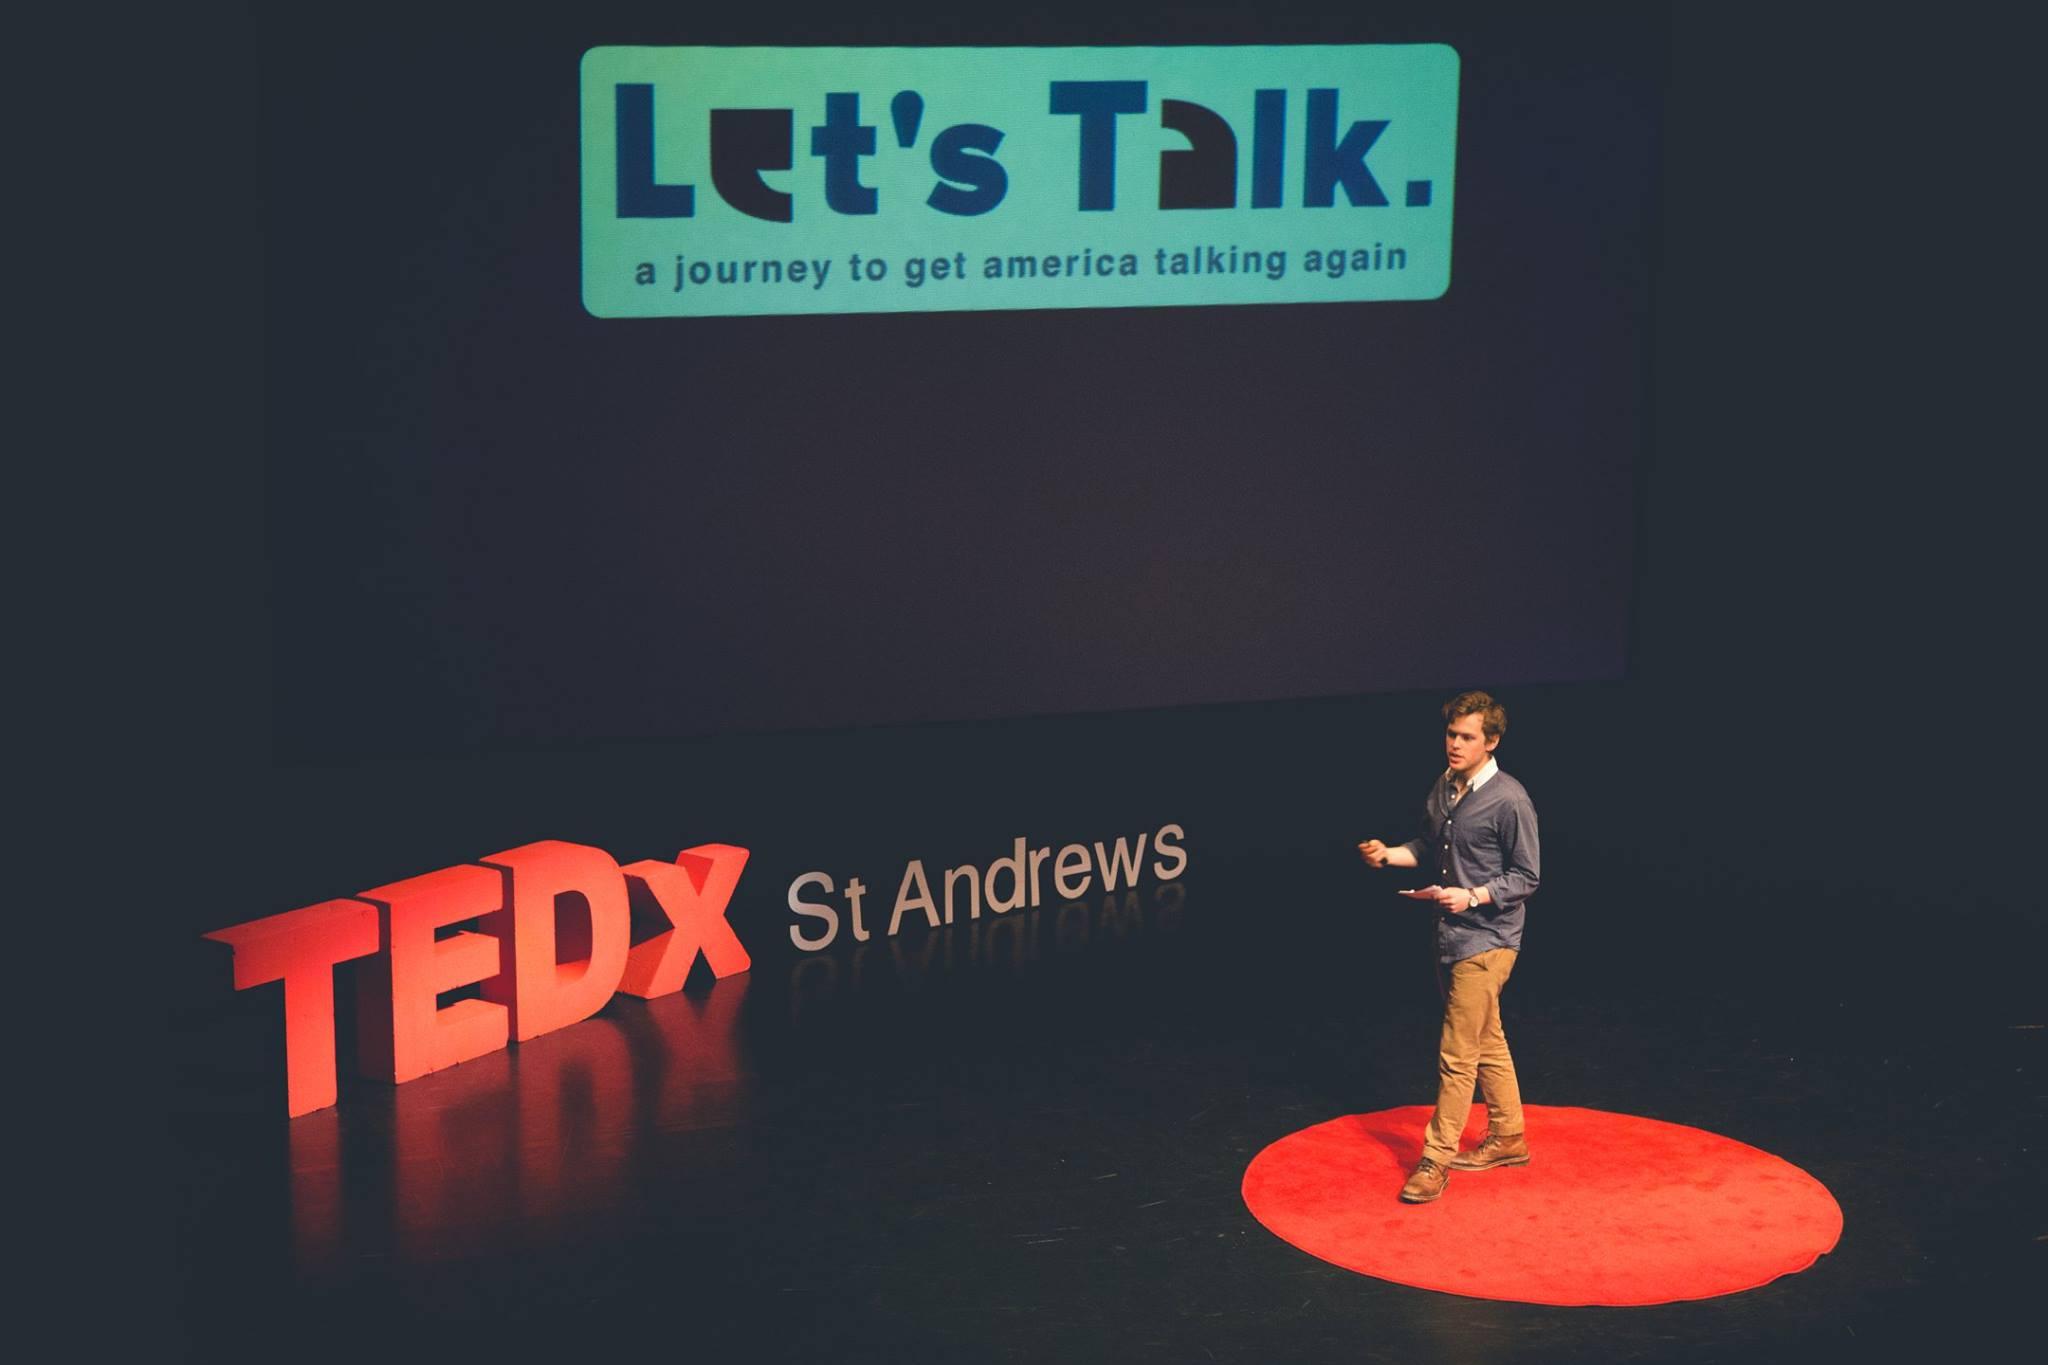 Photo From Tedx 9.jpg